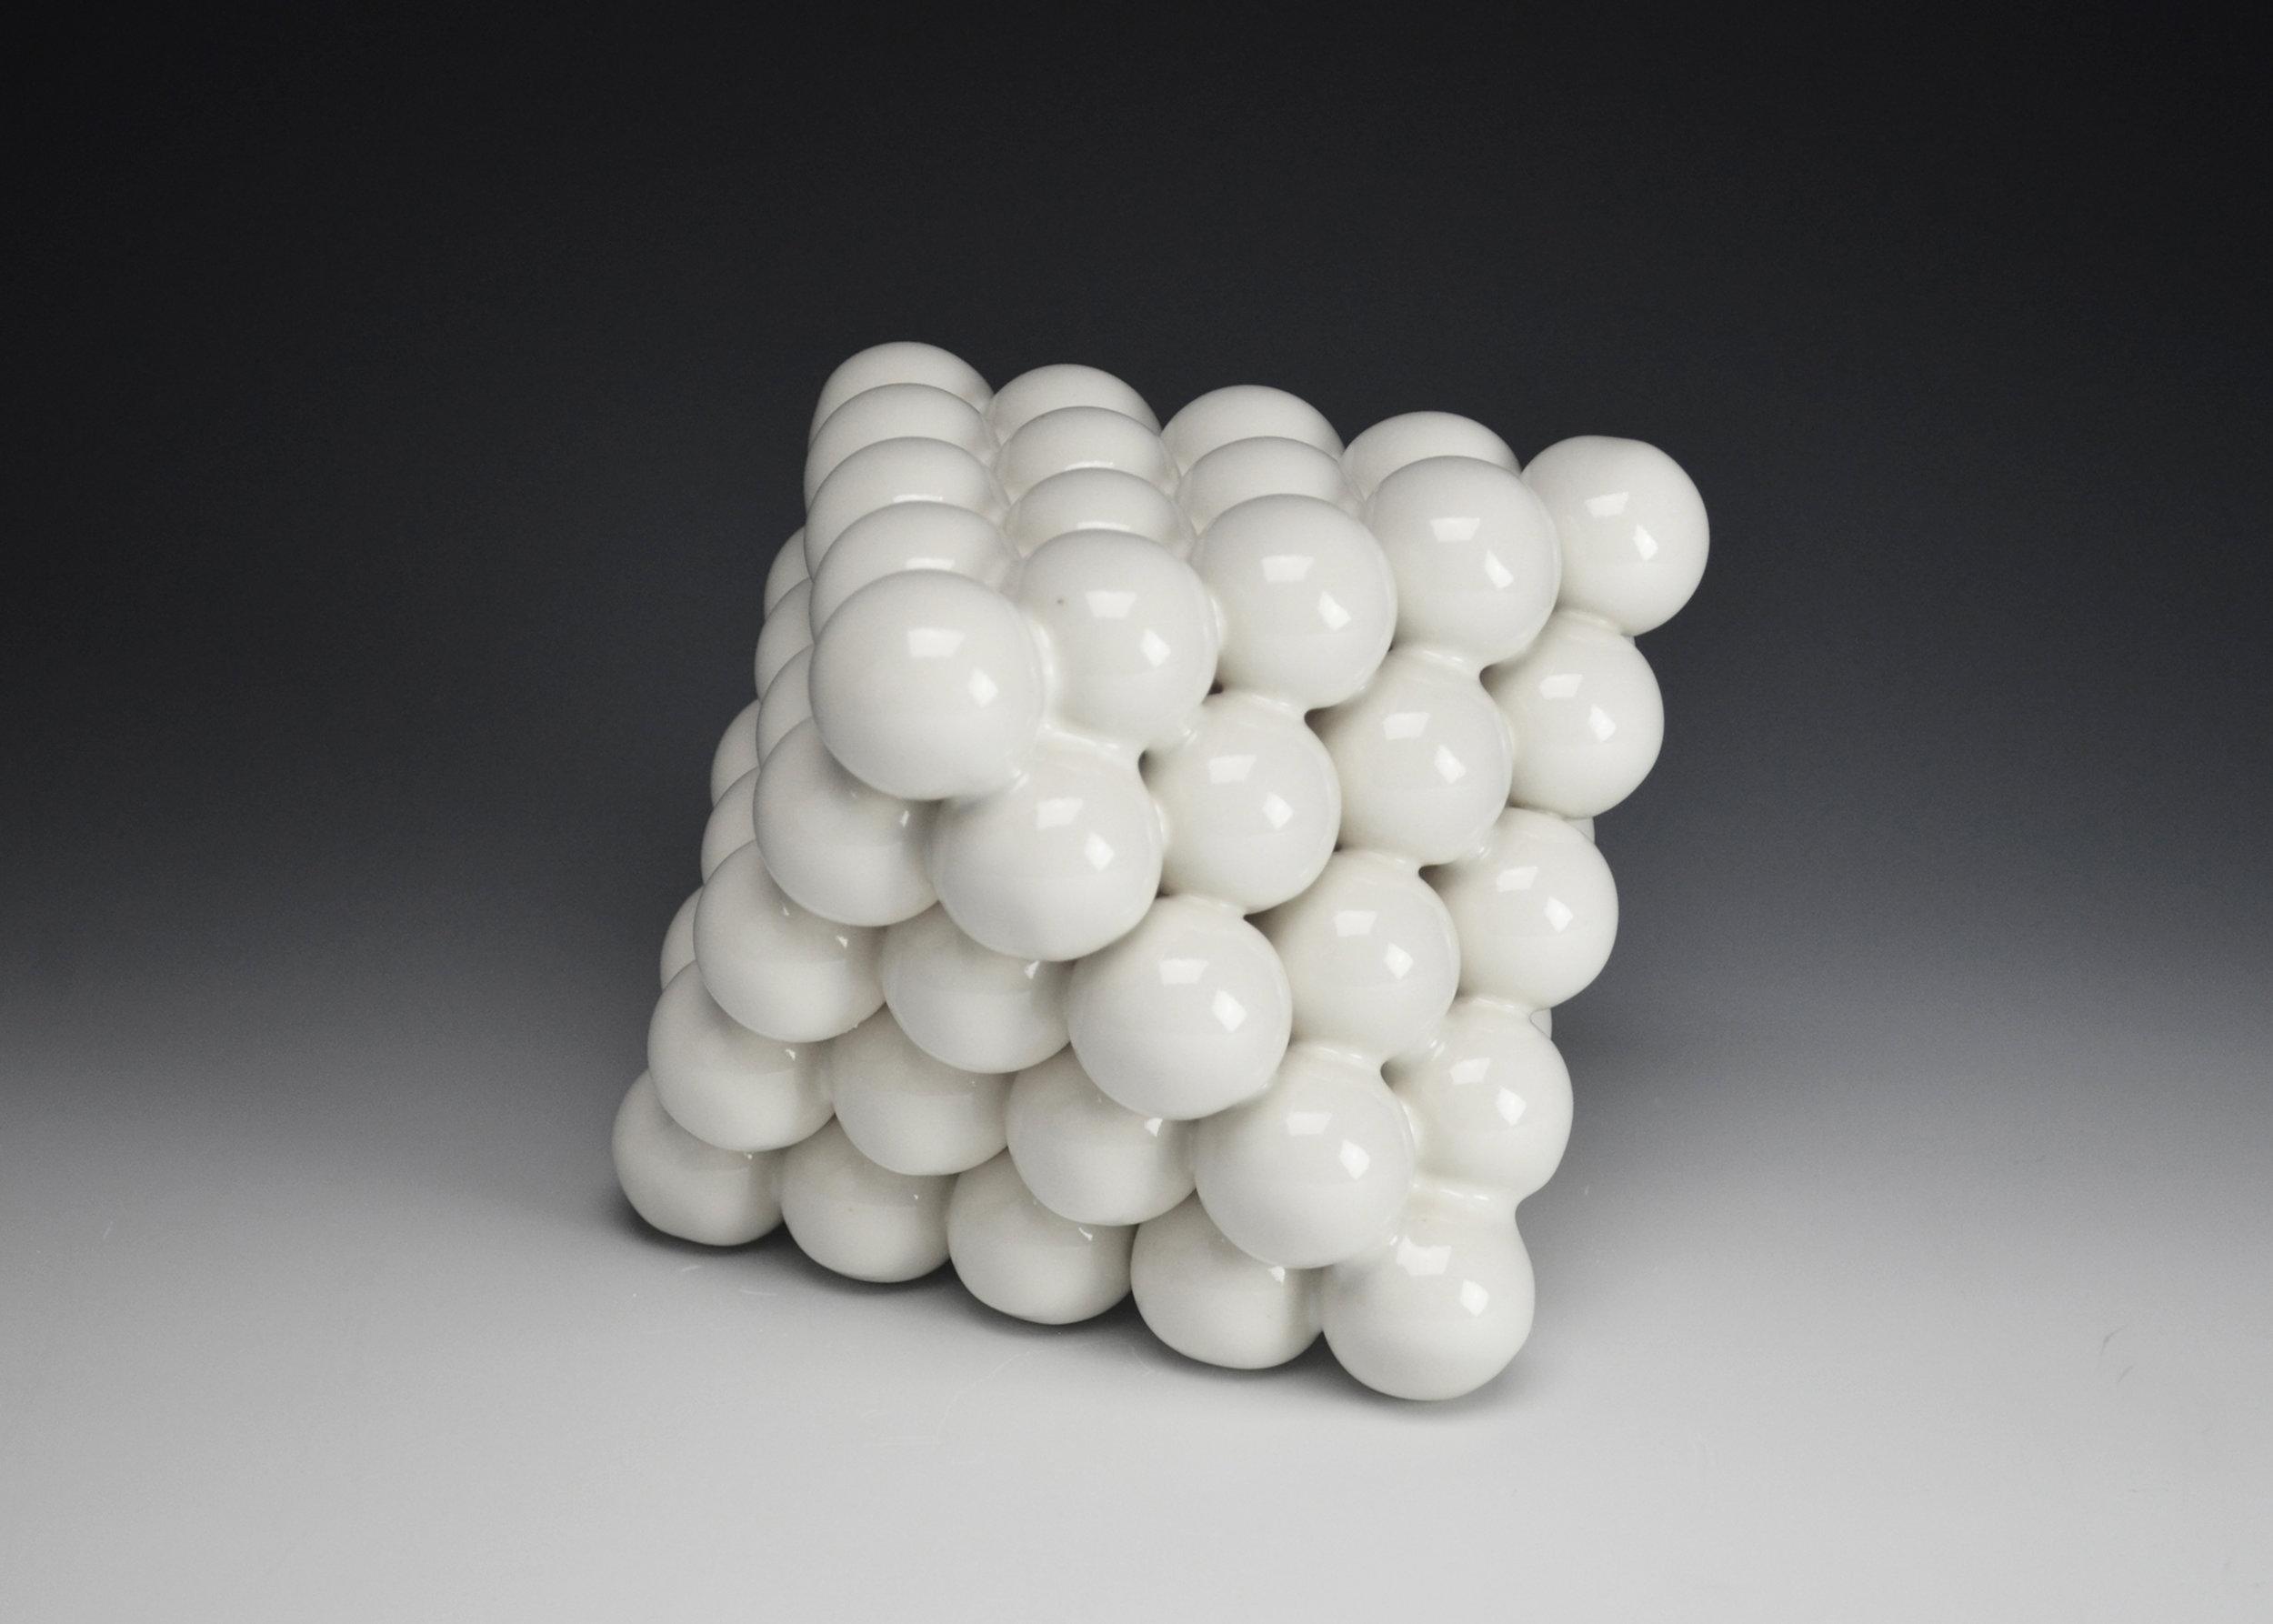 Ionic Series: Octahedron  |  6.5 x 6.5 x 9 inches  |  Porcelain, Glaze  |  2017